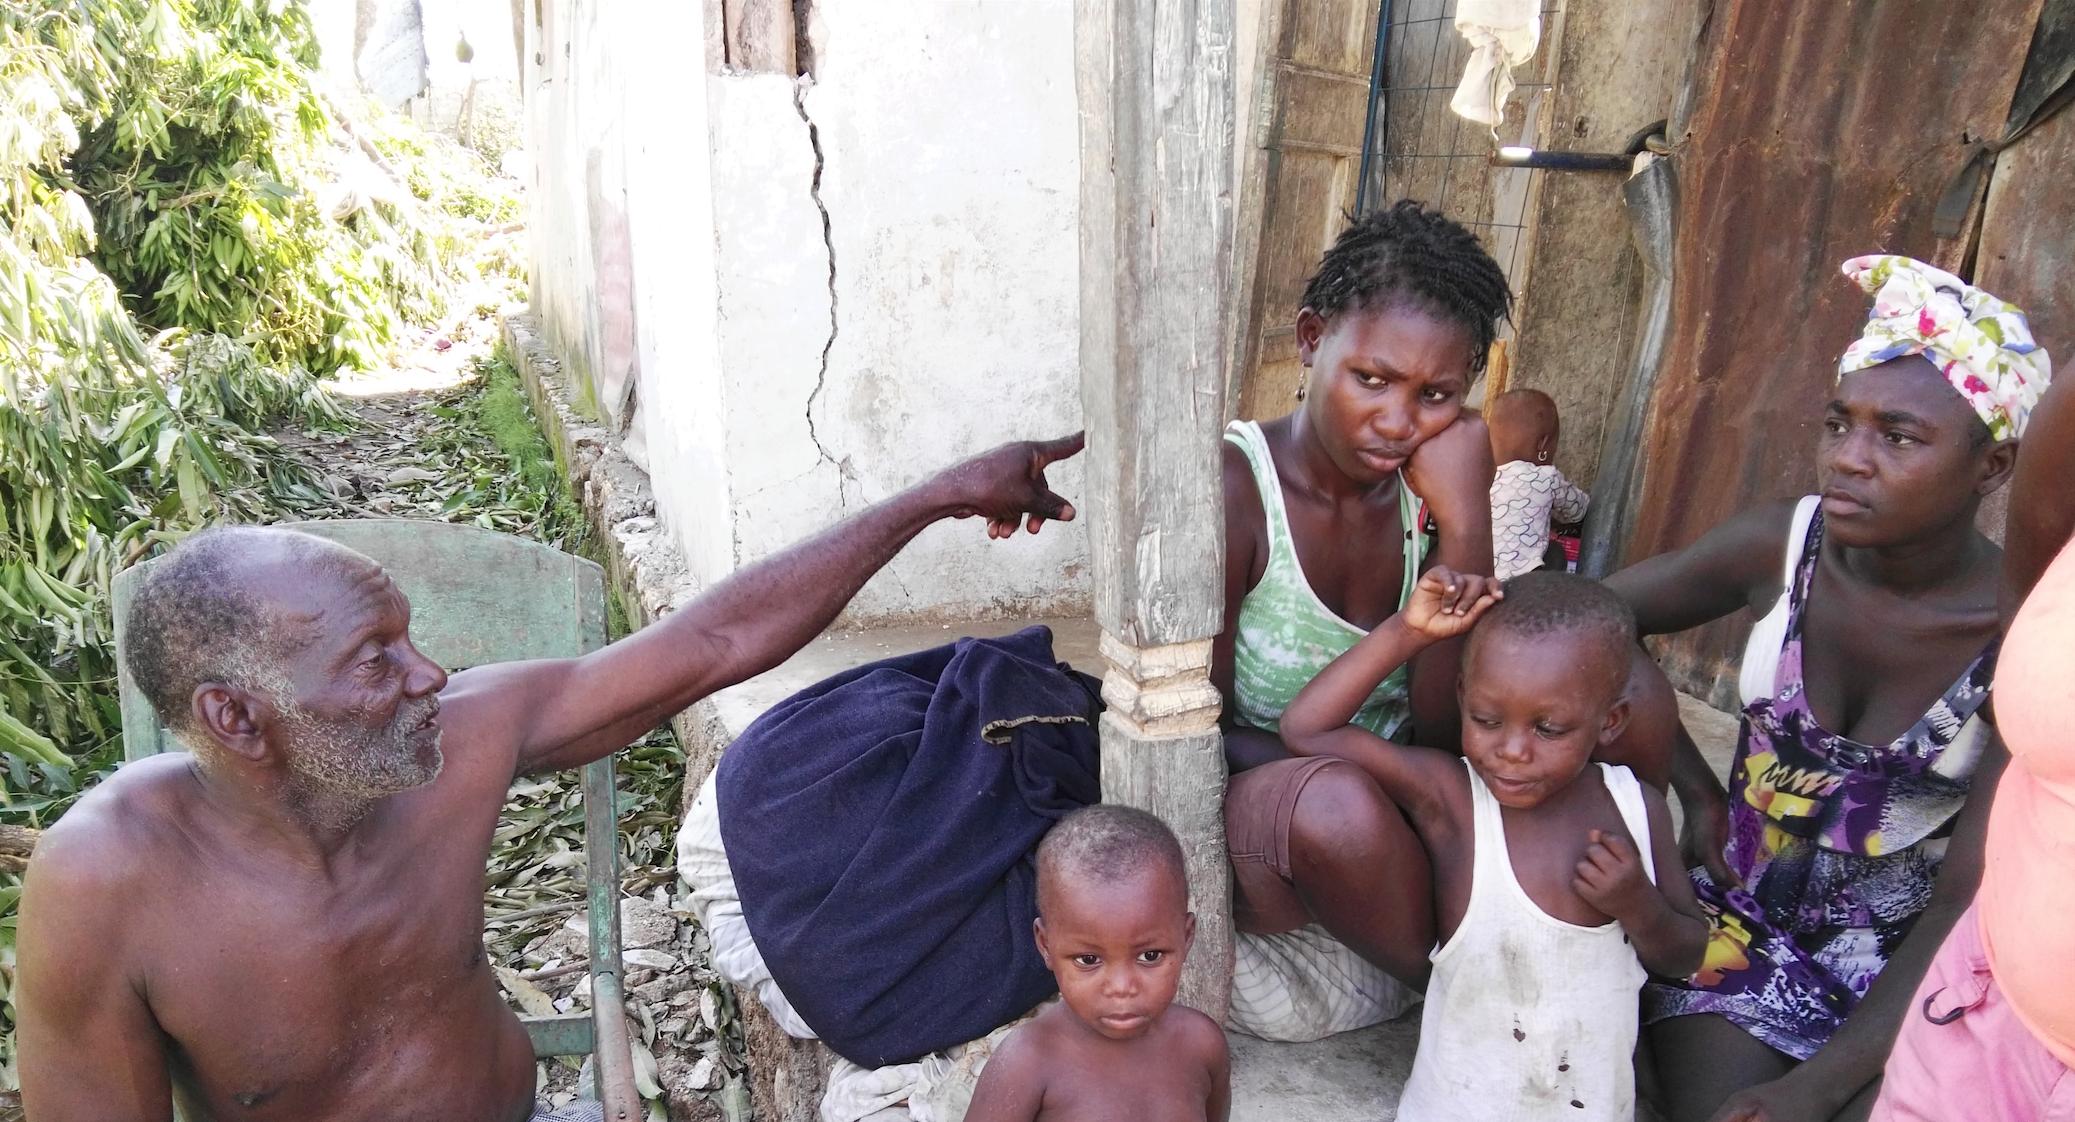 Joseph St. Fort and his neighbors in Camp Perrin, Haiti.(Jeanty Junior Augustin)